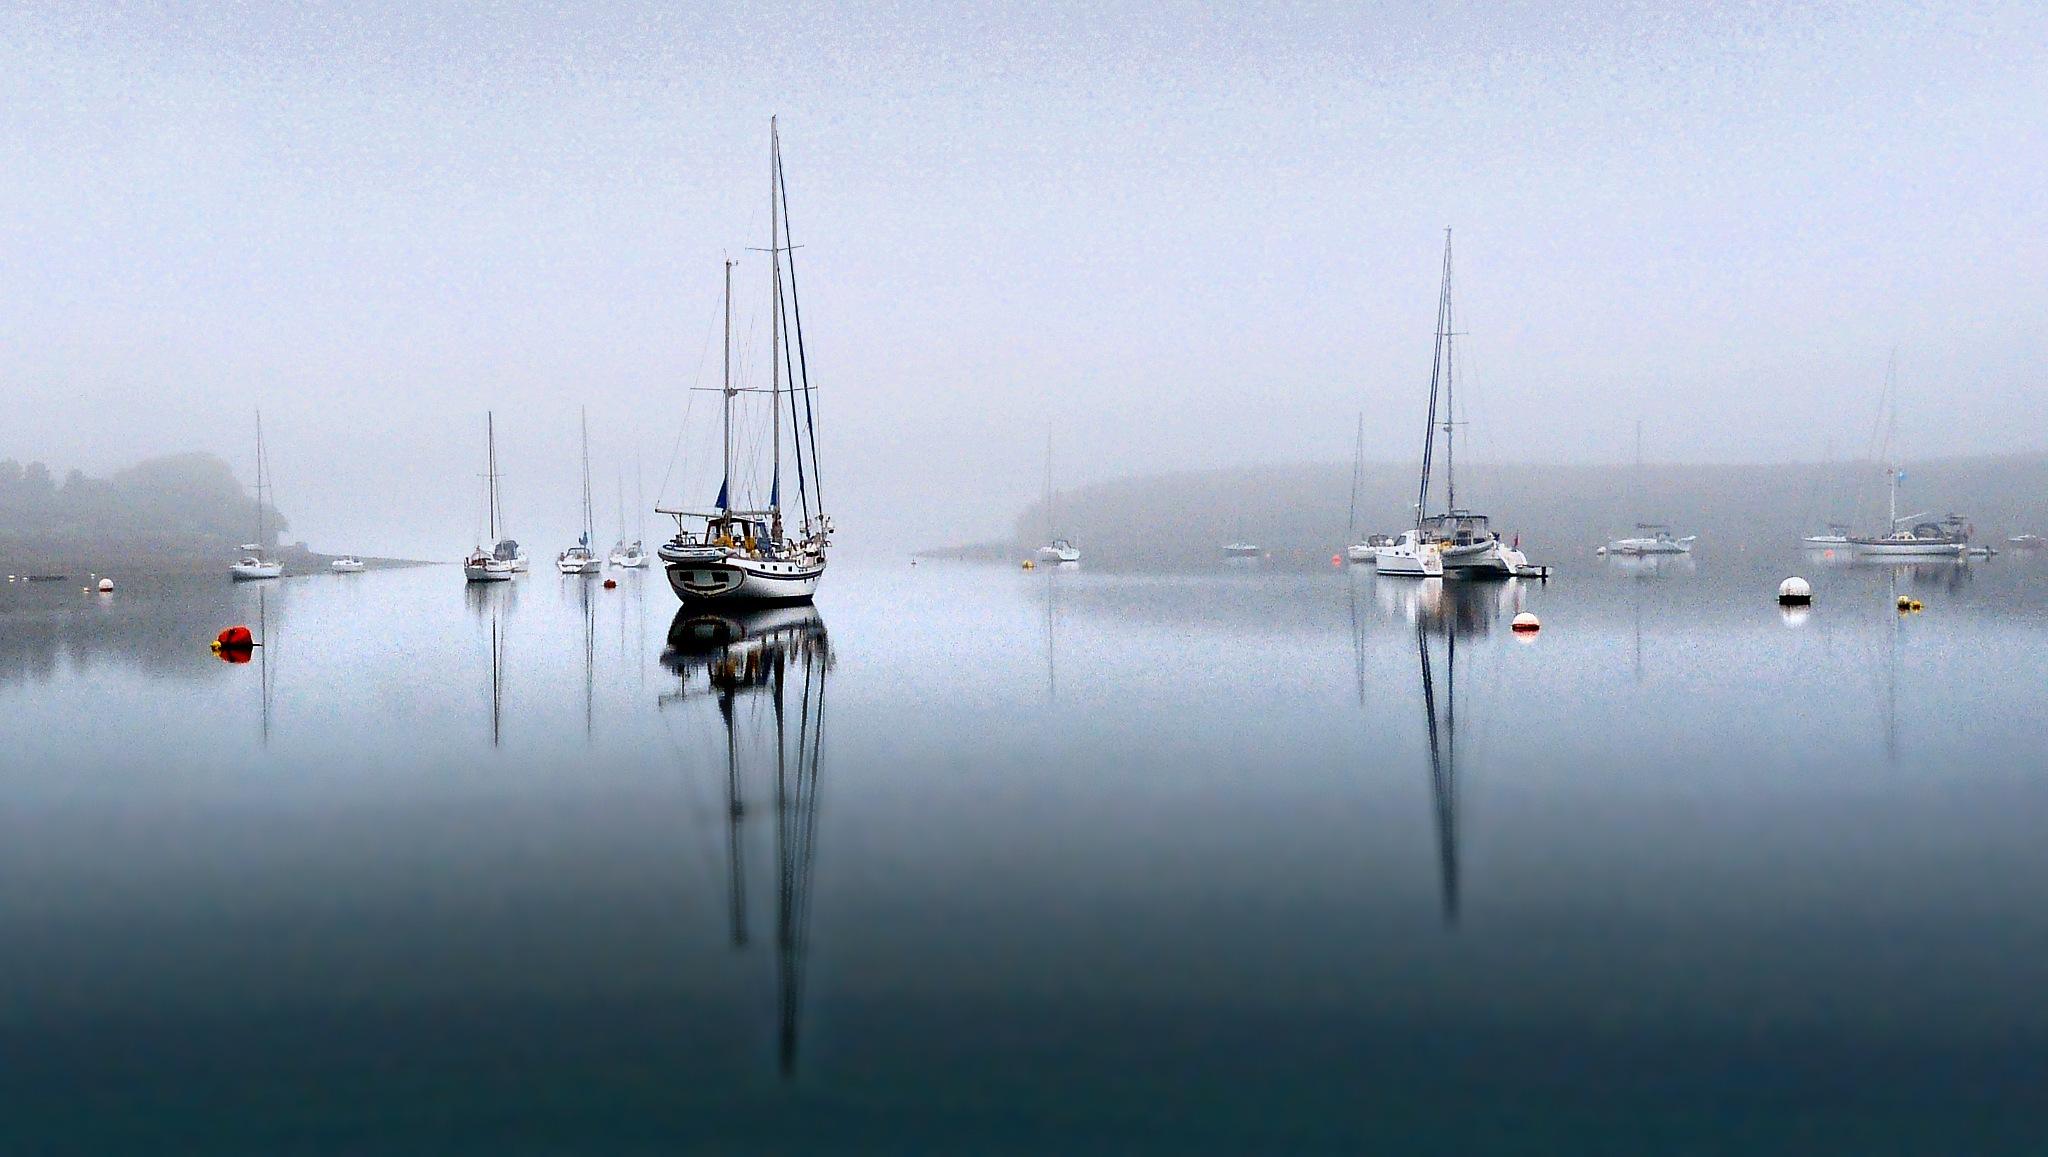 Misty Moorings by PeterMChambers